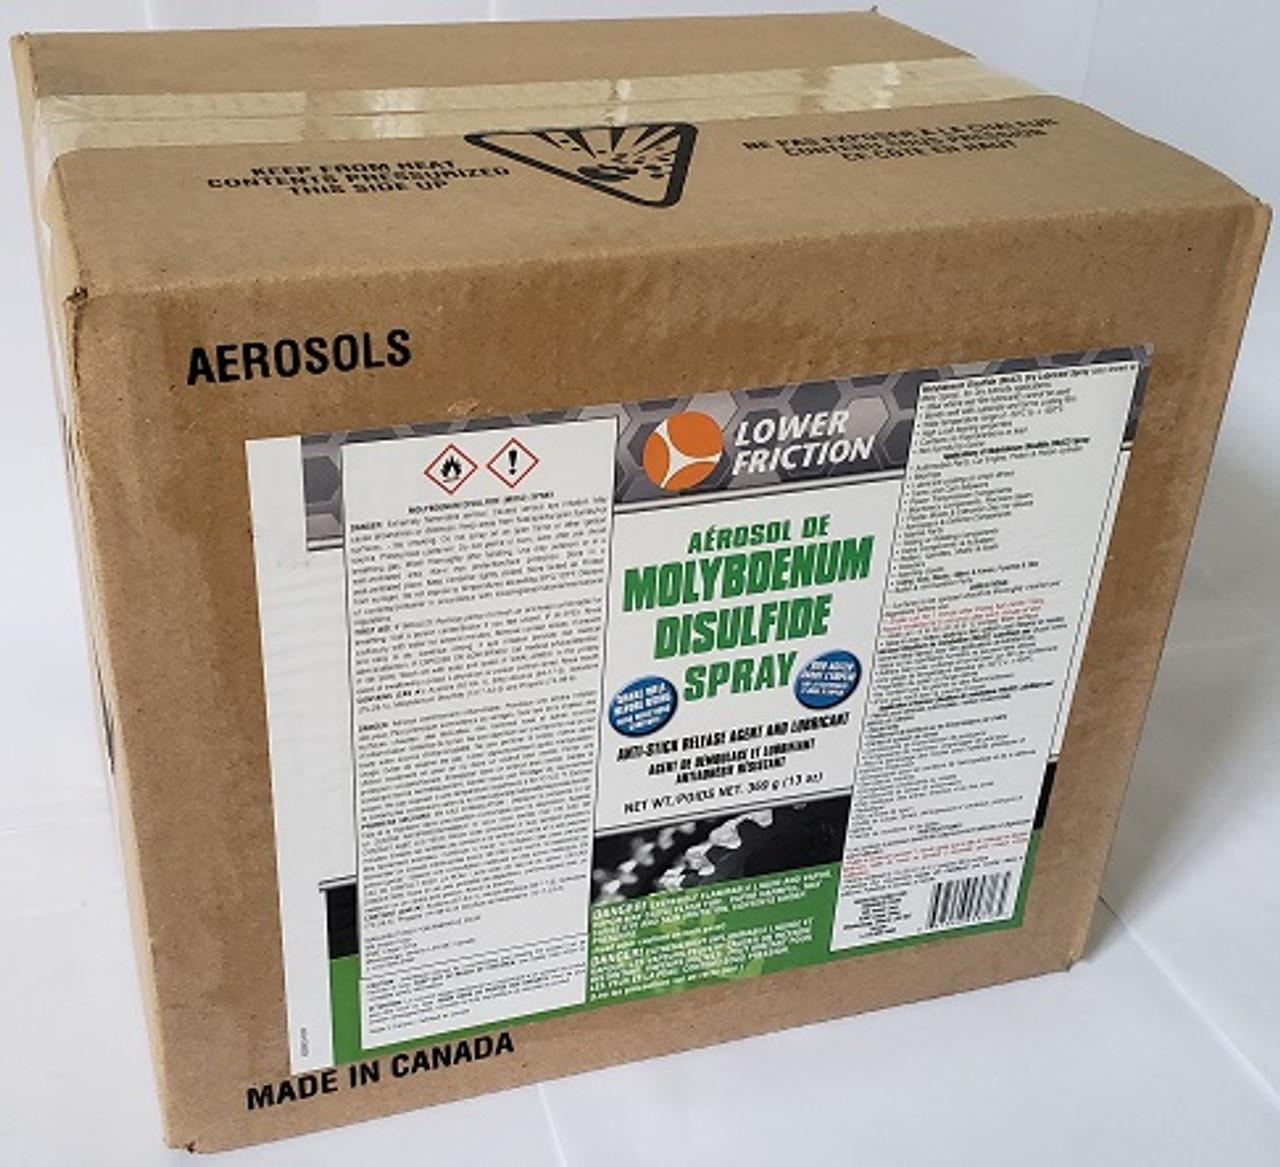 Molybdenum Disulfide (MoS2) Aerosol Spray, 13 Oz/370 grams